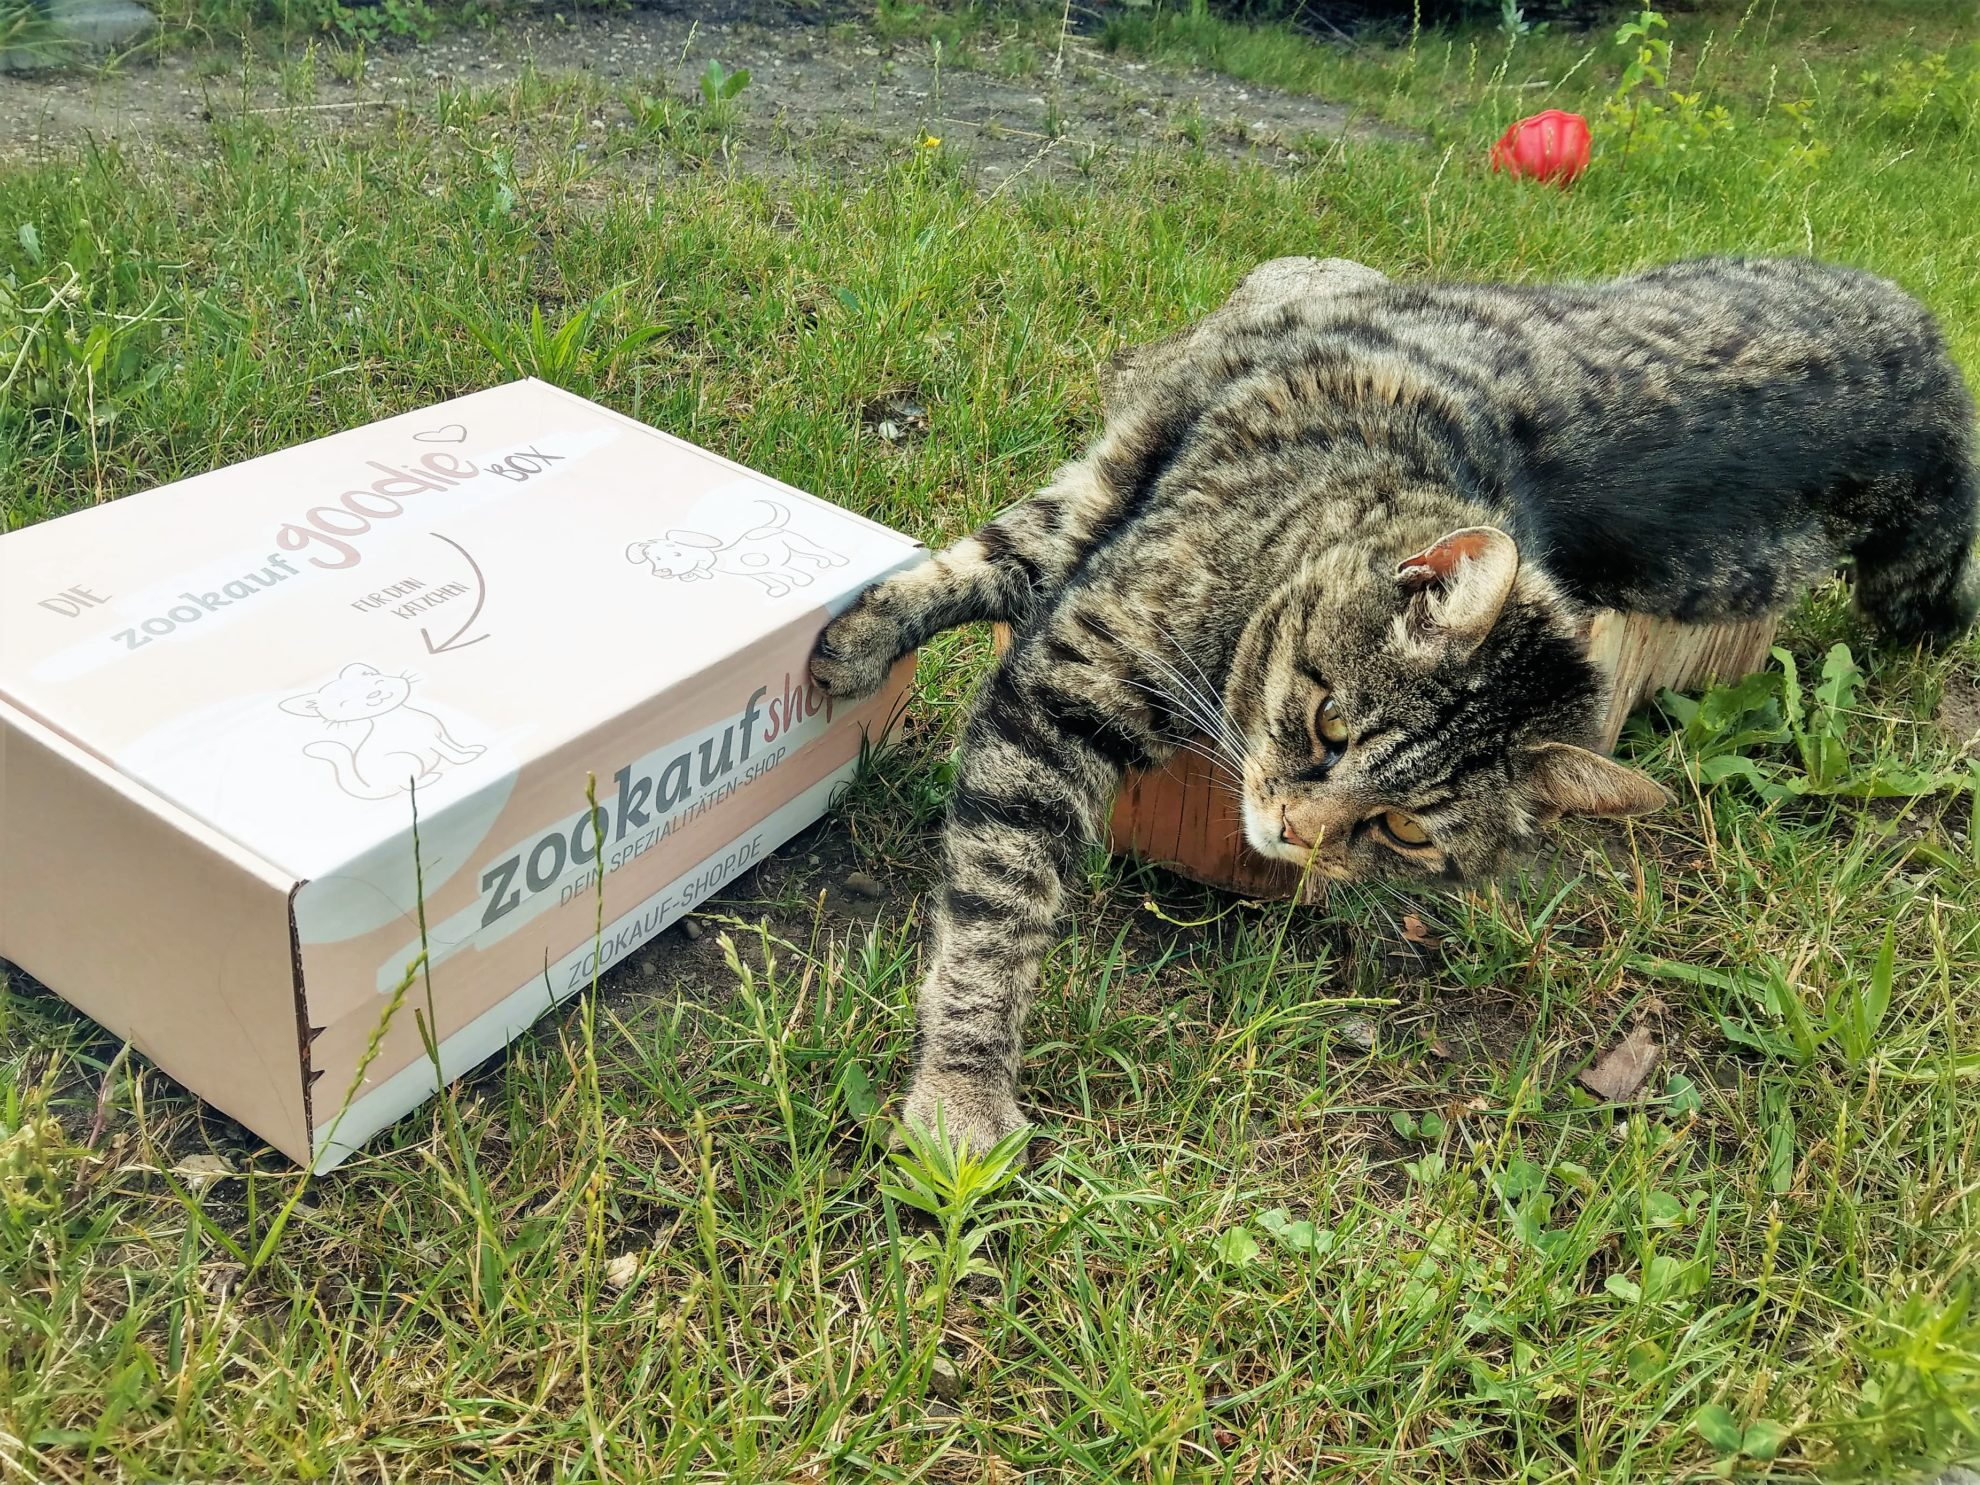 zookauf-shop, GoodieBox, Kooperation, Kater, Haustier